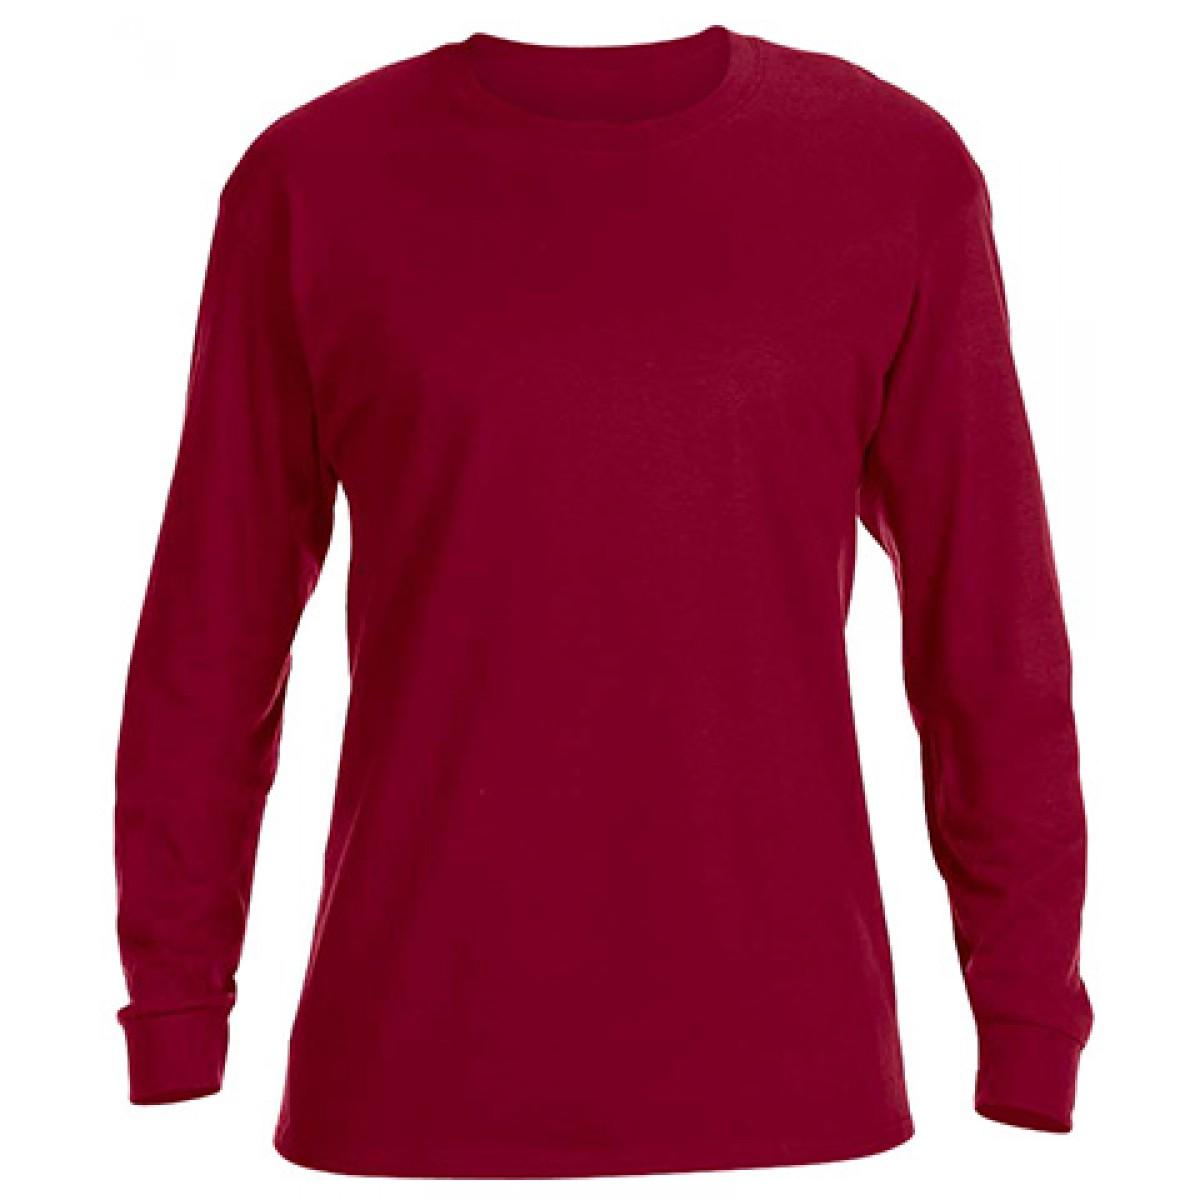 Basic Long Sleeve Crew Neck -Cardinal Red-YL